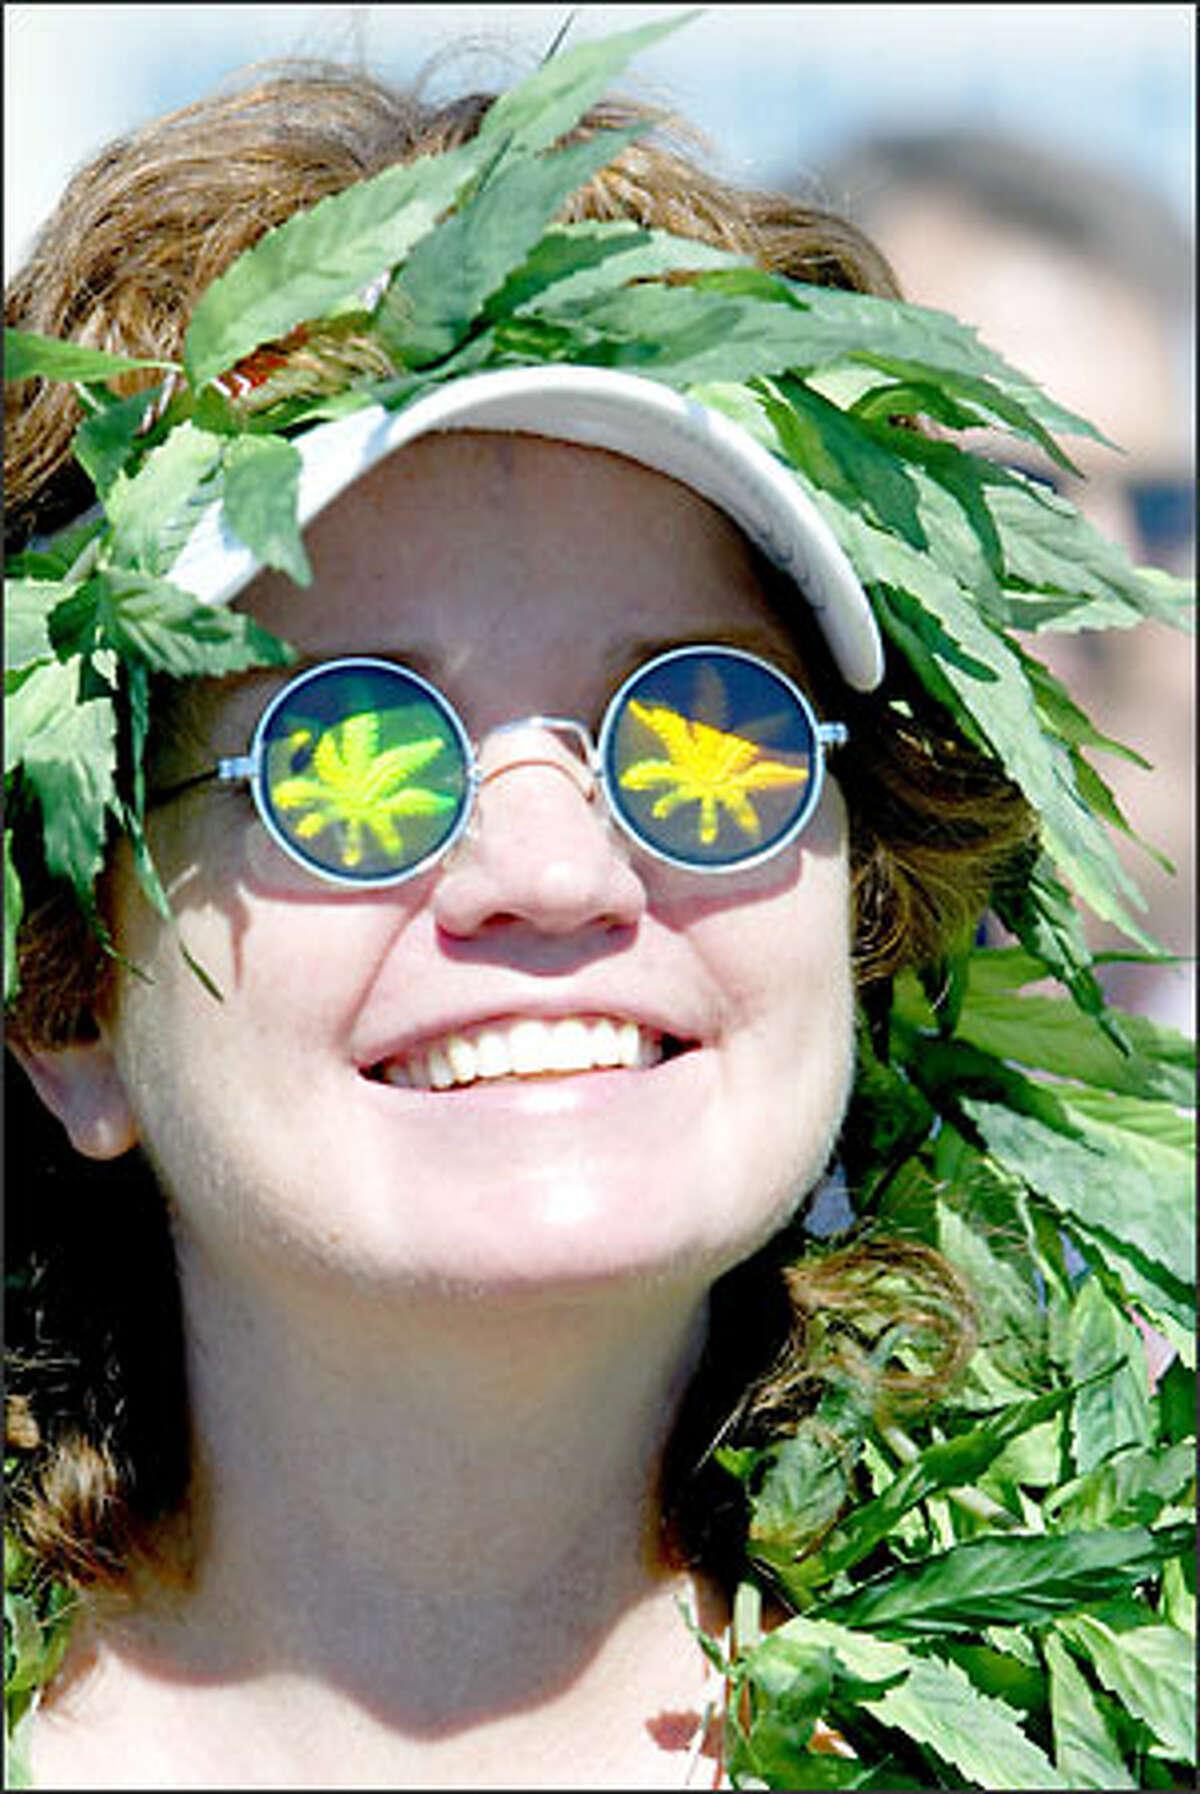 Kitty Barbieto of Gold Bar soaks up Hempfest at Myrtle Edwards Park. She said she supports legalization of marijuana.